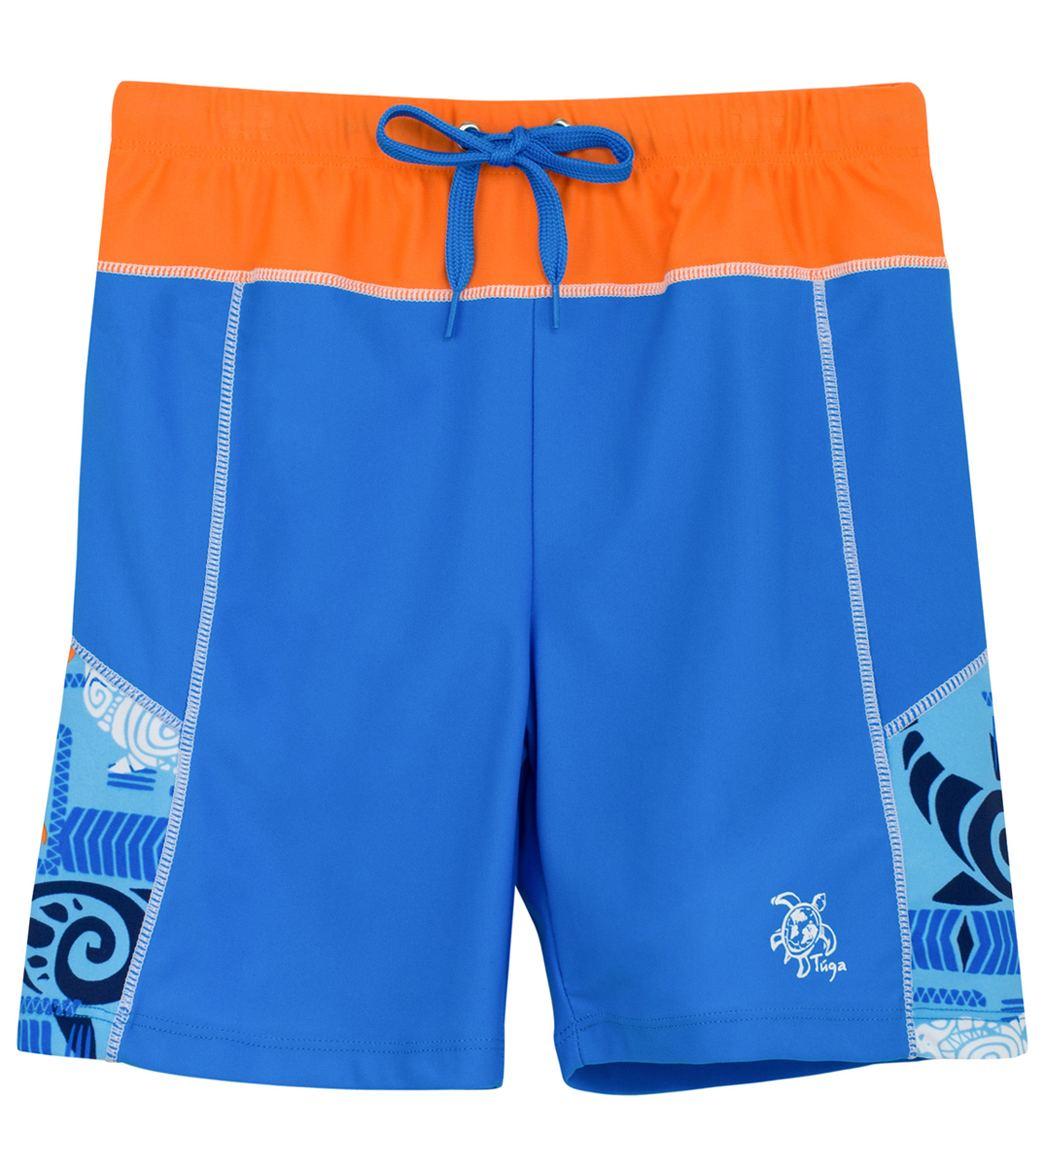 c6dbd6dae8 Tuga Boys' South Swell Swim Shorts (Toddler, Little Kid, Big Kid) at  SwimOutlet.com